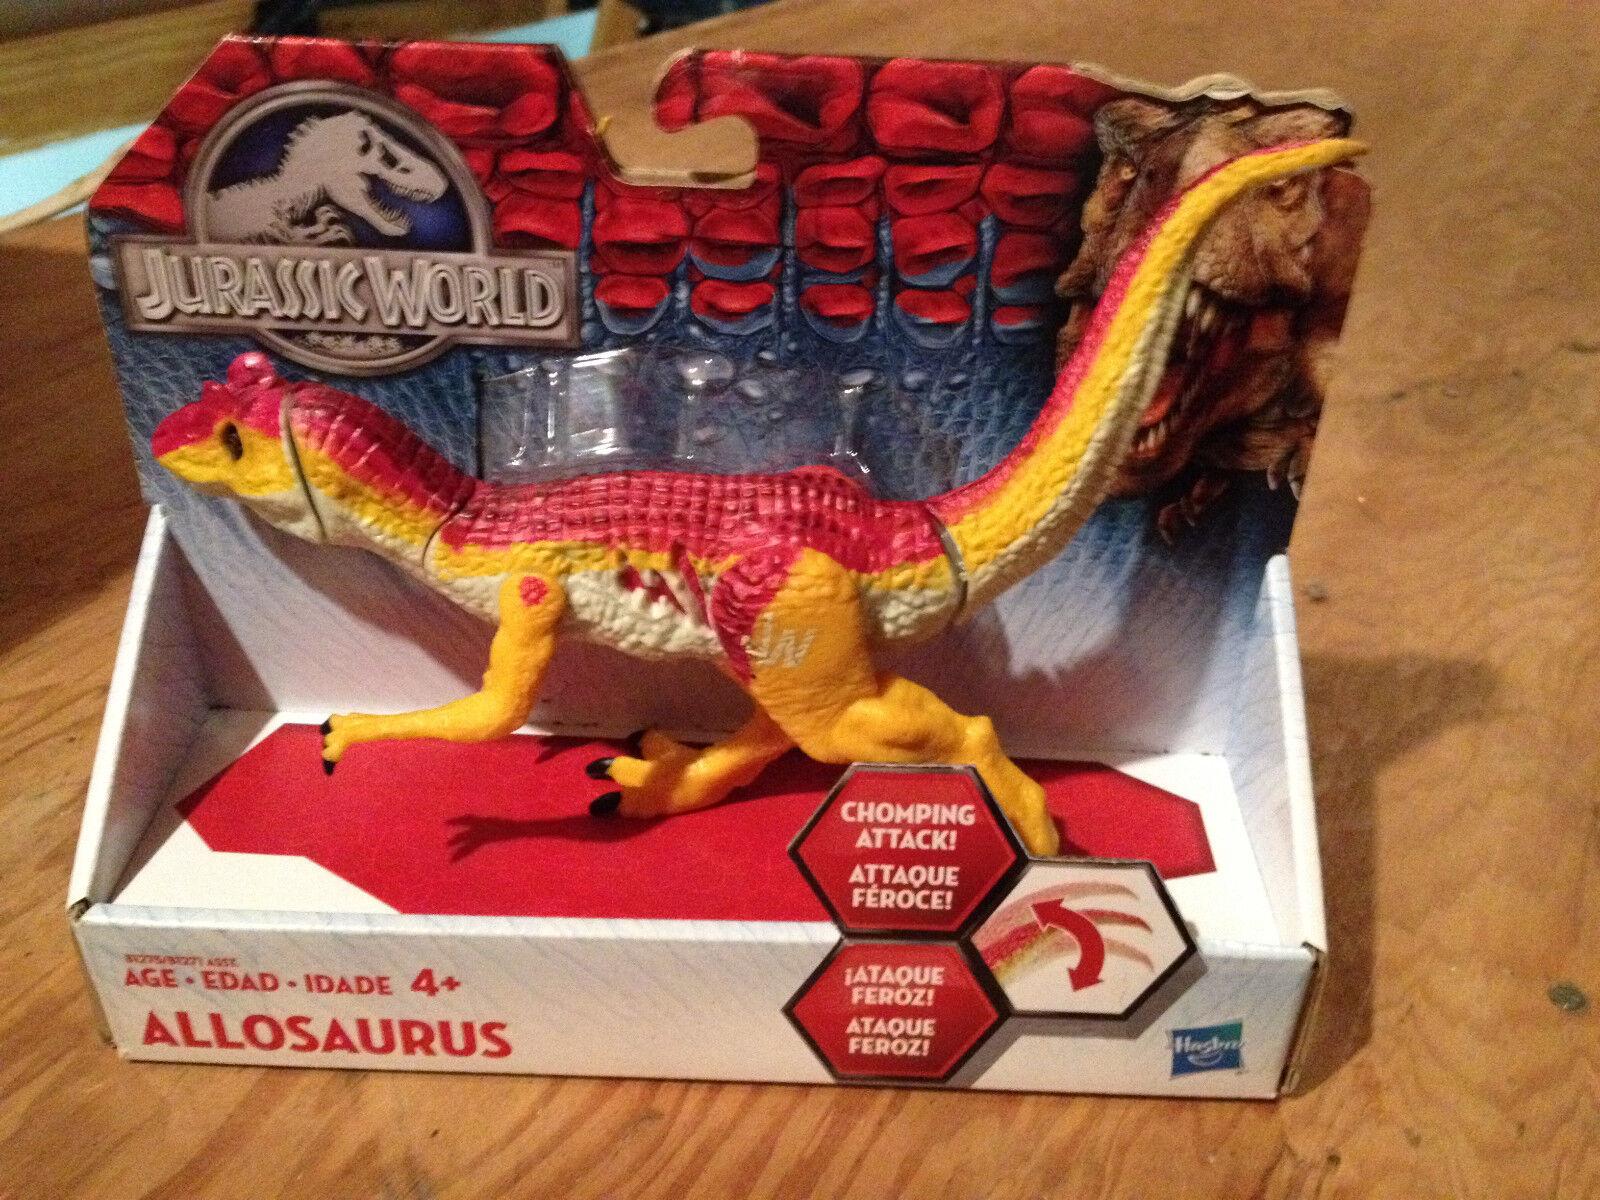 NEW     Hasbro Jurassic World Chomping ALLOSAURUS